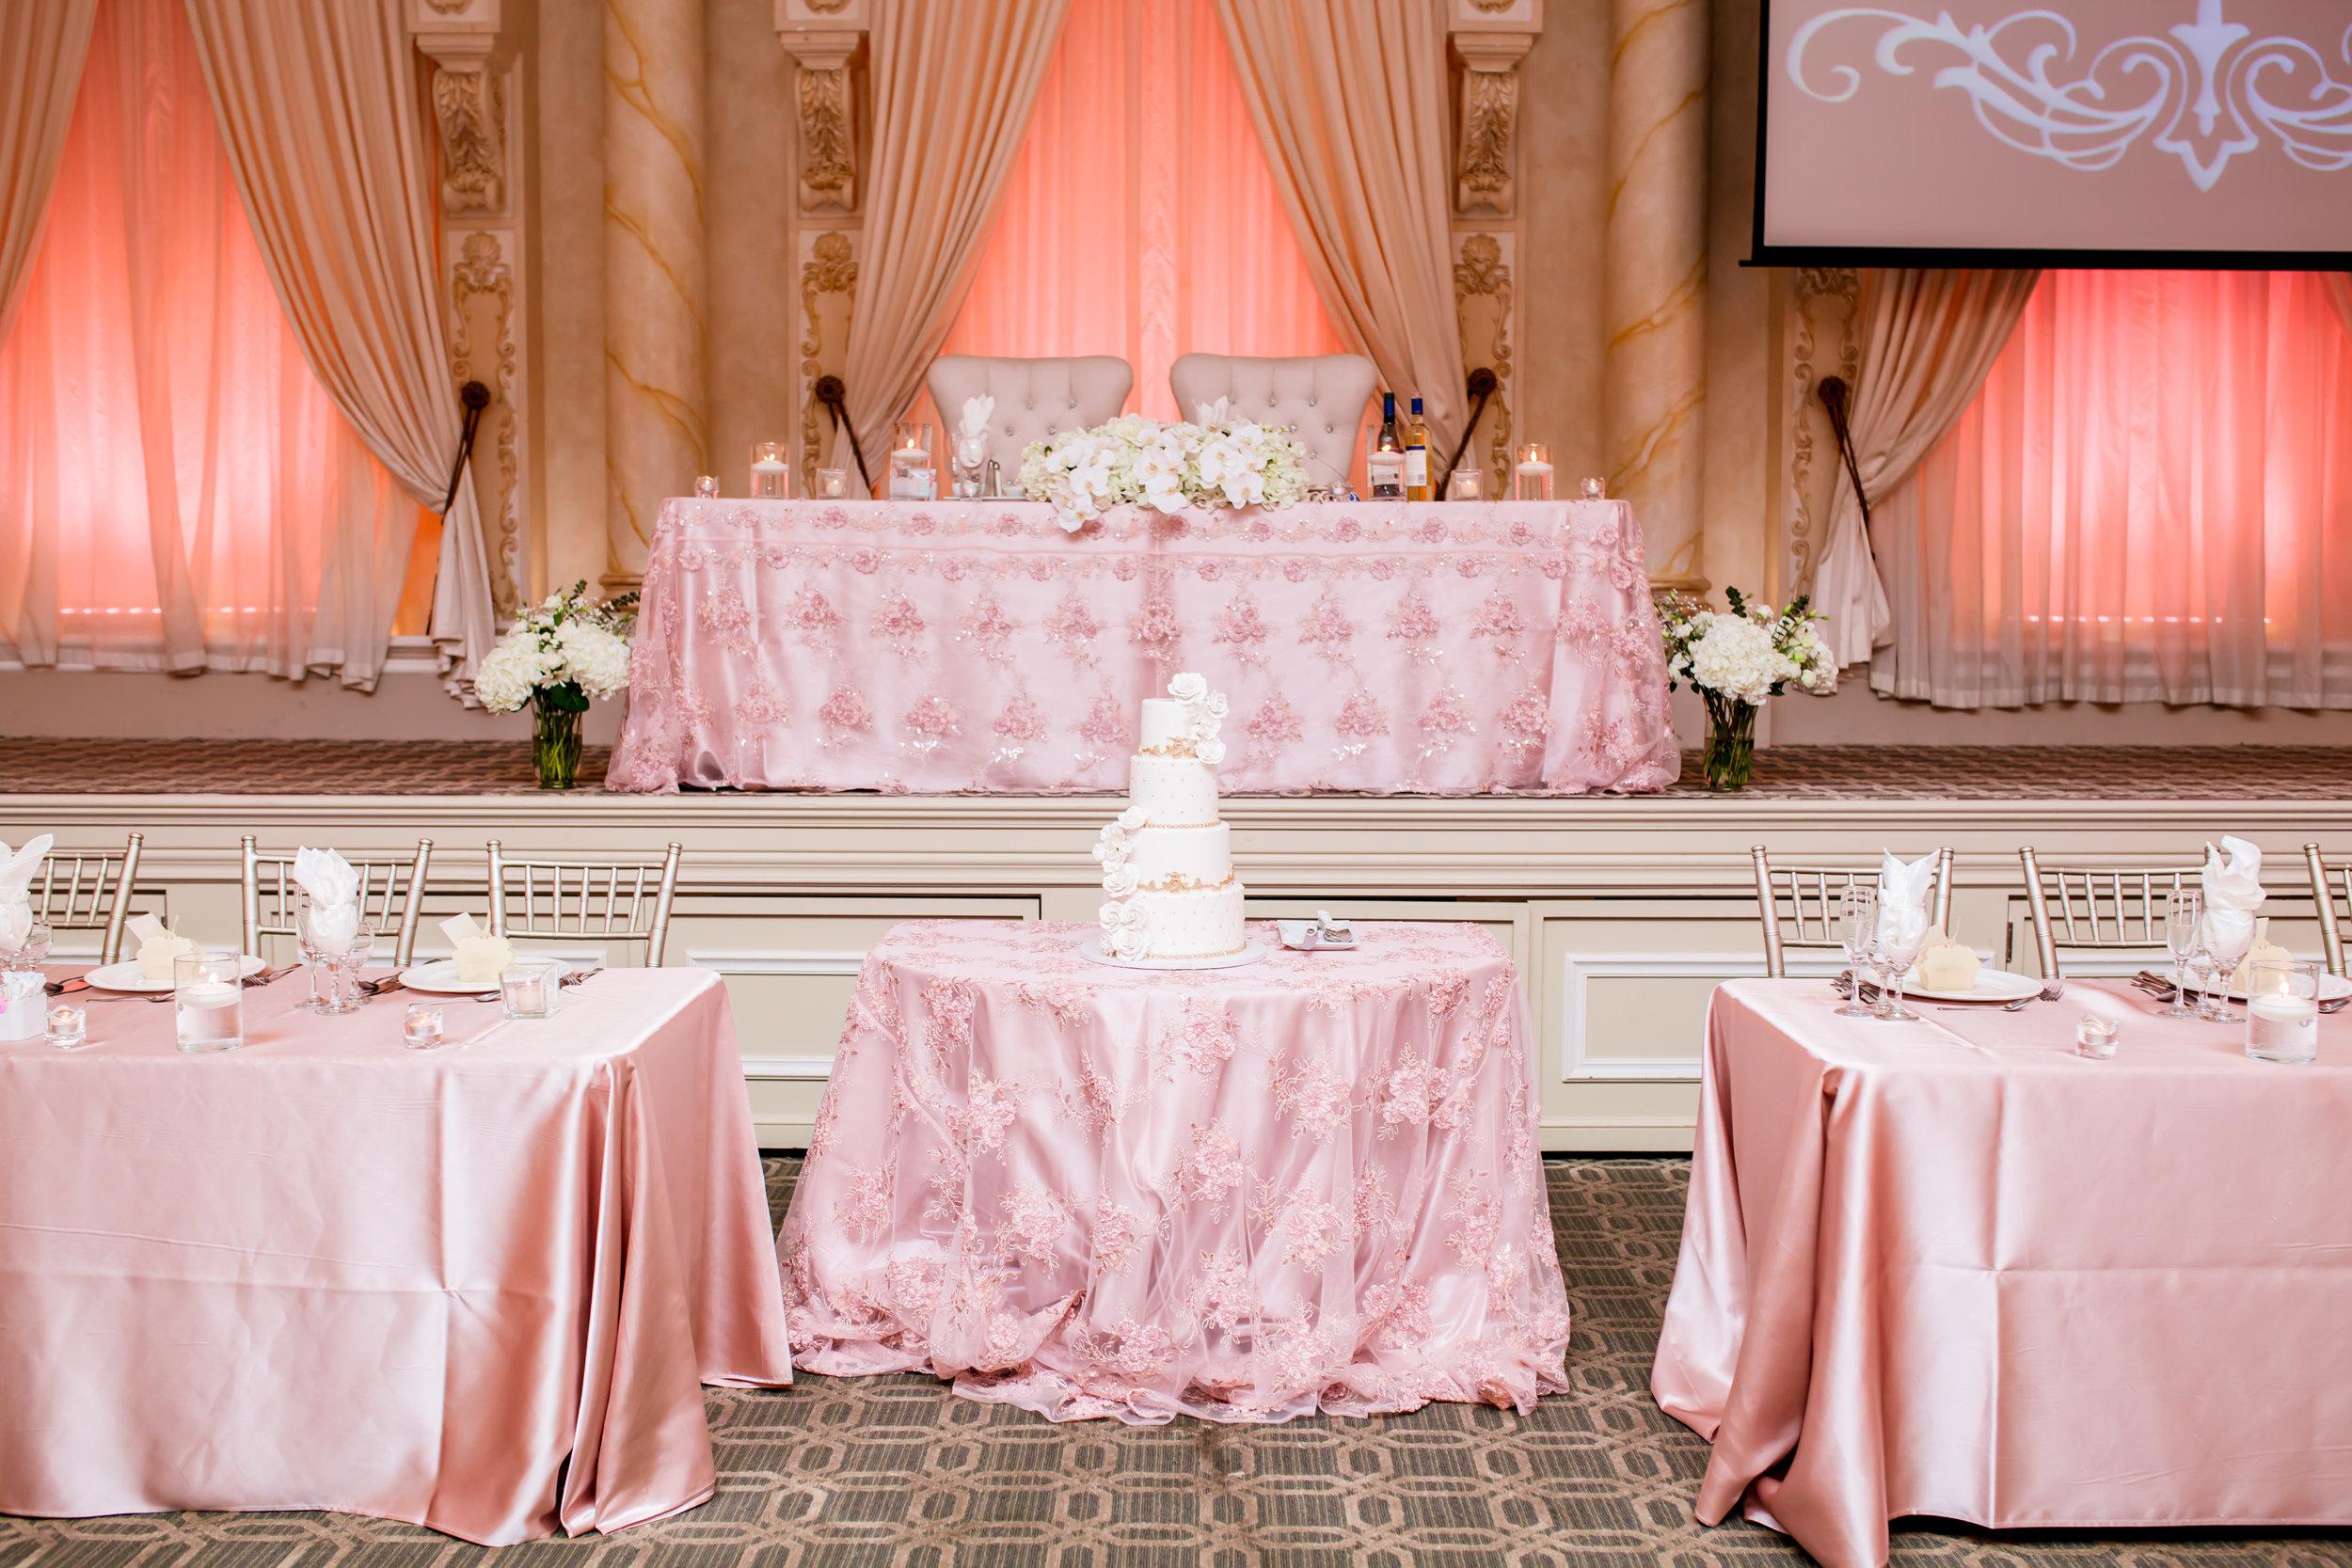 Lavinia_Carl_Wedding_Paradise_Banquet_Hall_Karimah_Gheddai_Photography_2